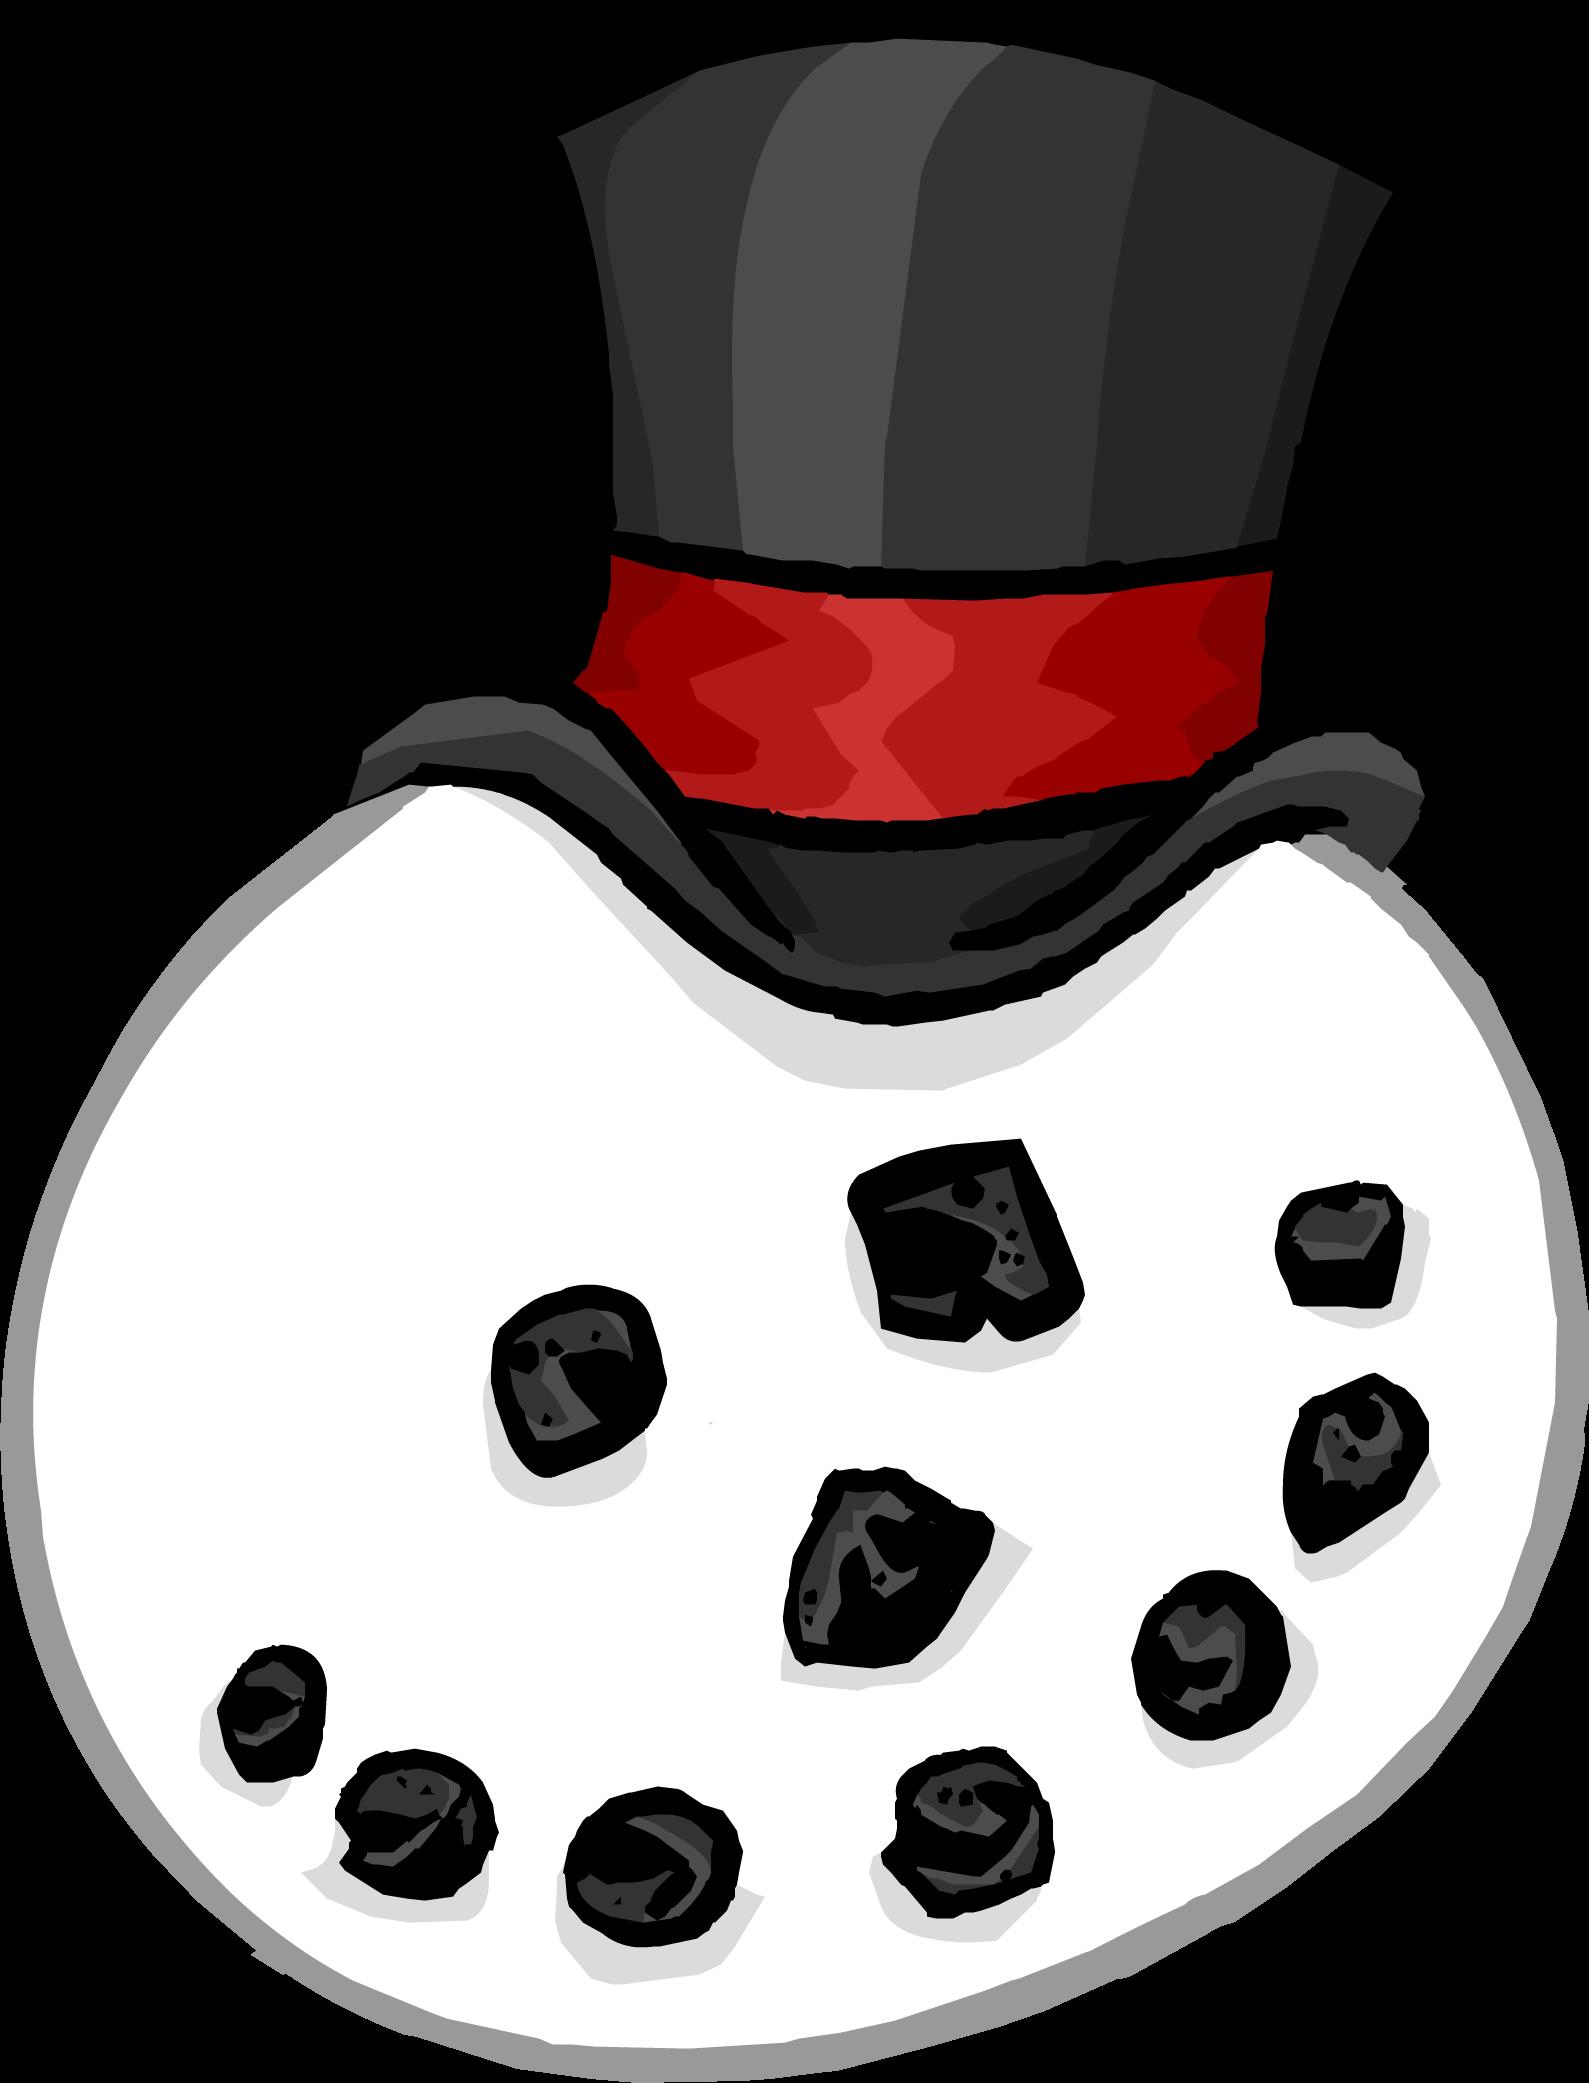 Snowman Head | Club Penguin Wiki | FANDOM powered by Wikia